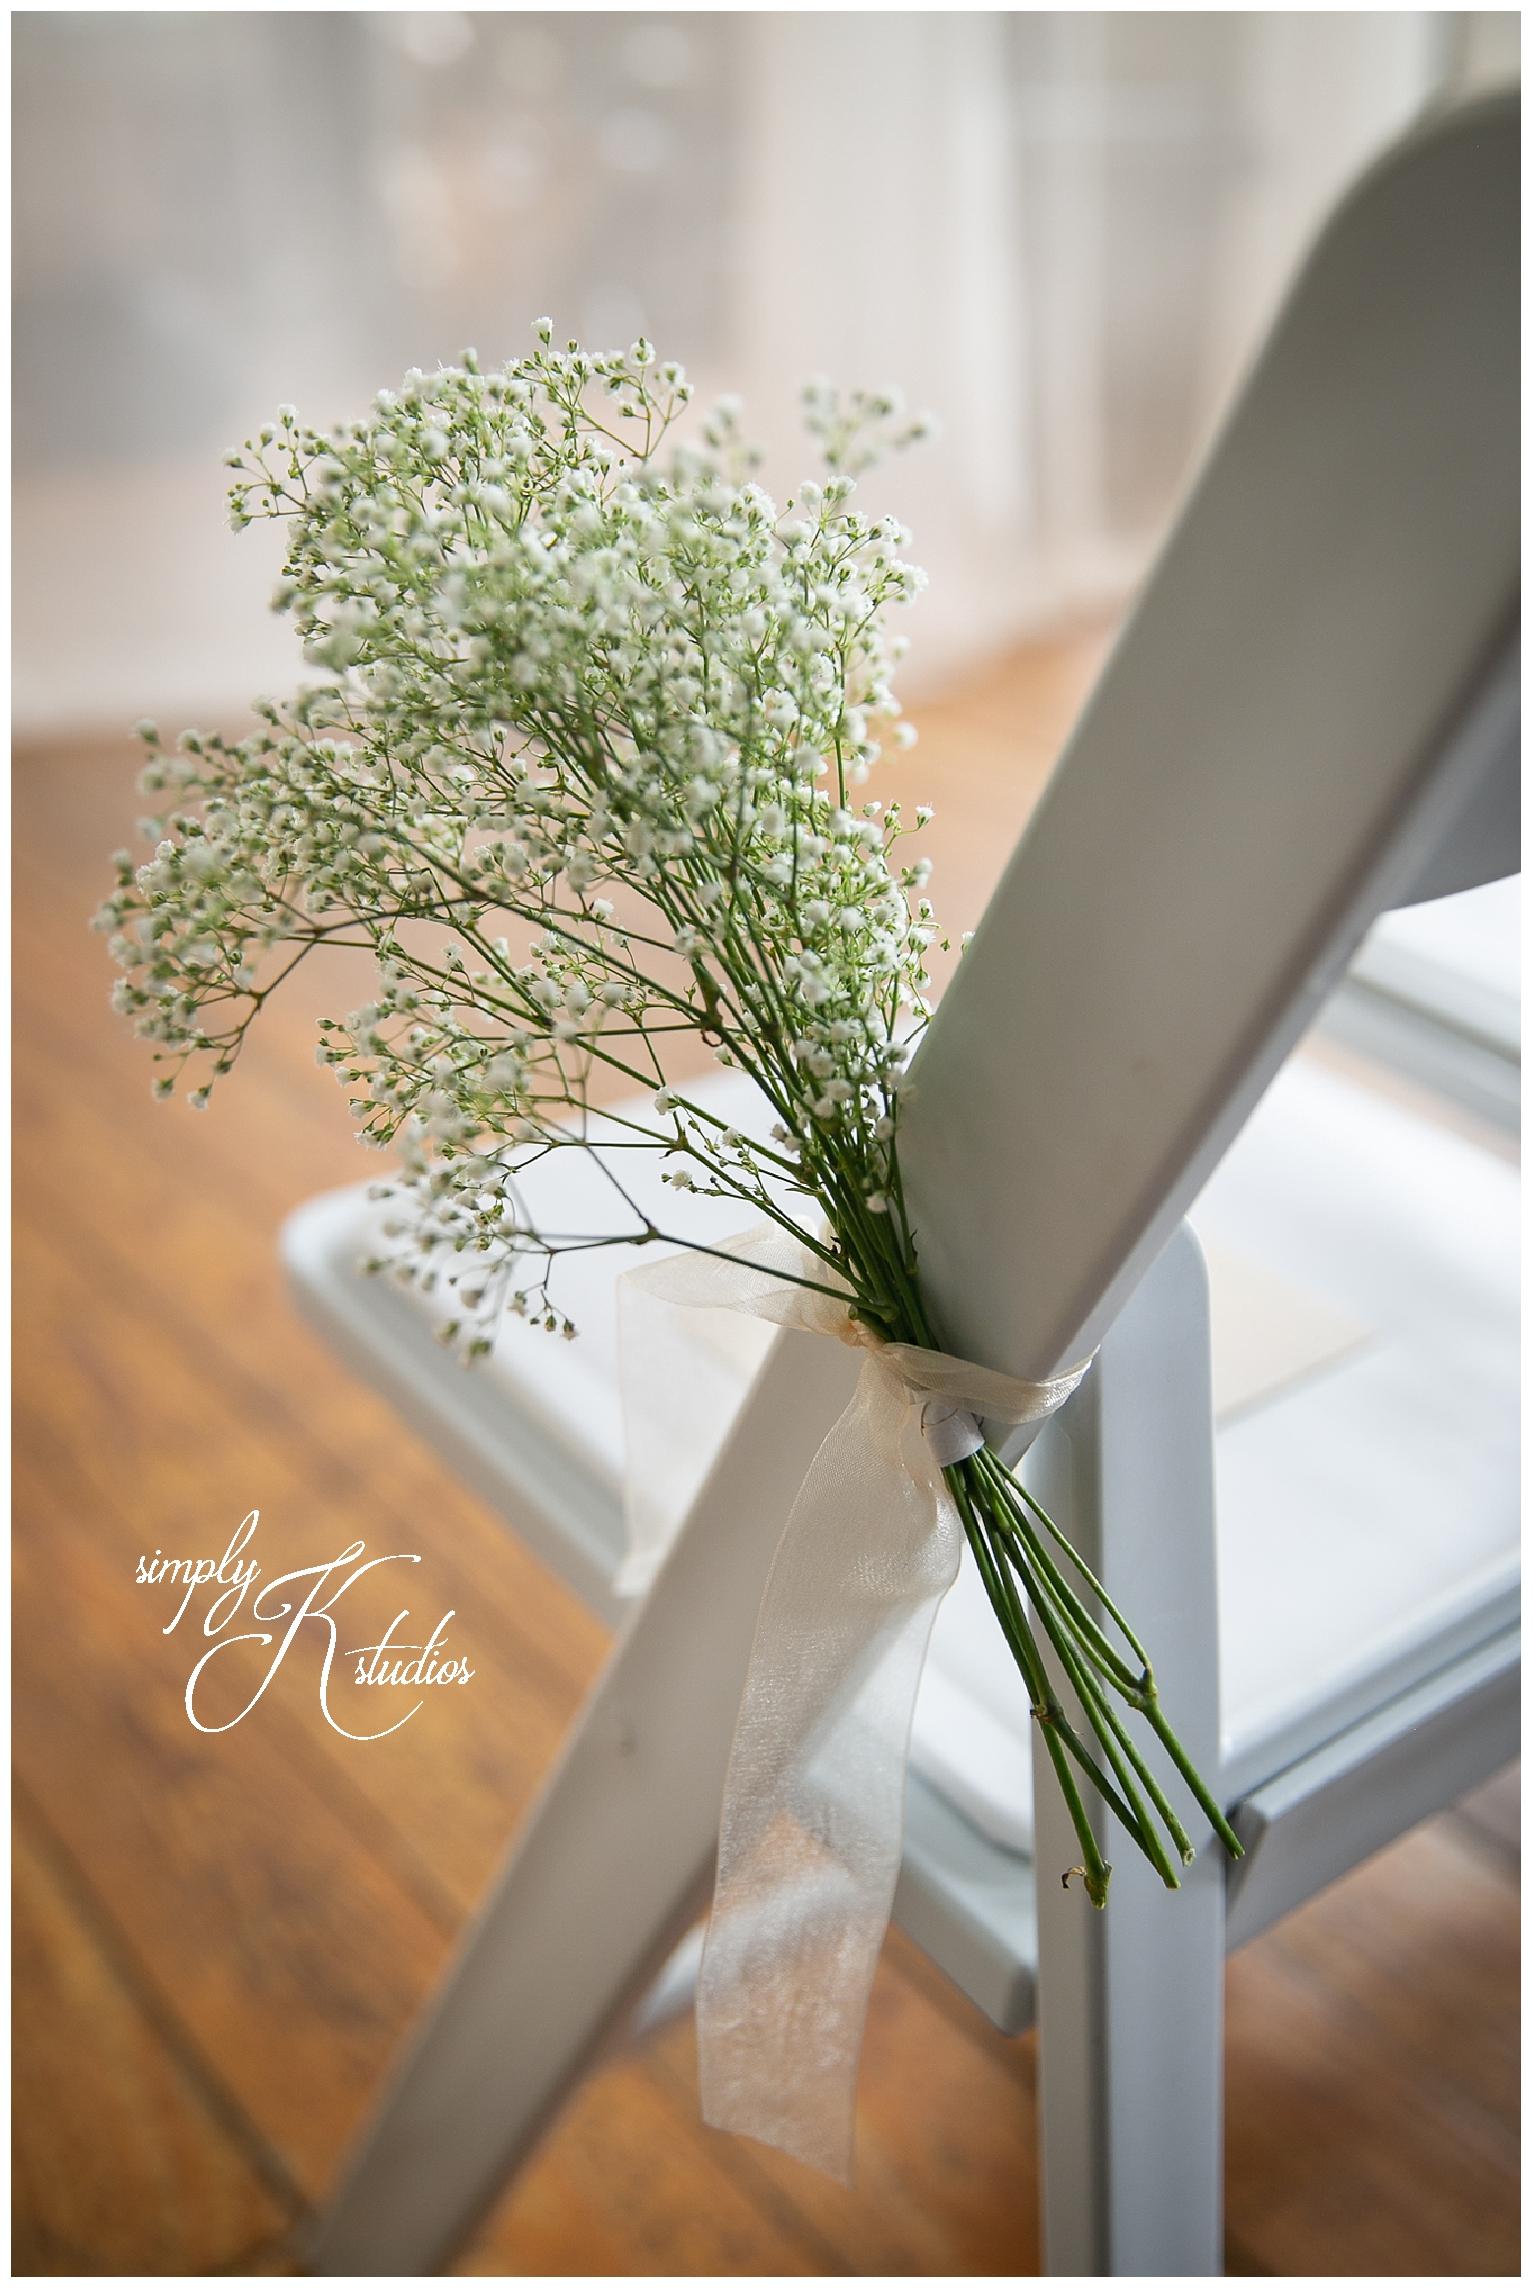 Floral Design by Melissa Ceremony.jpg